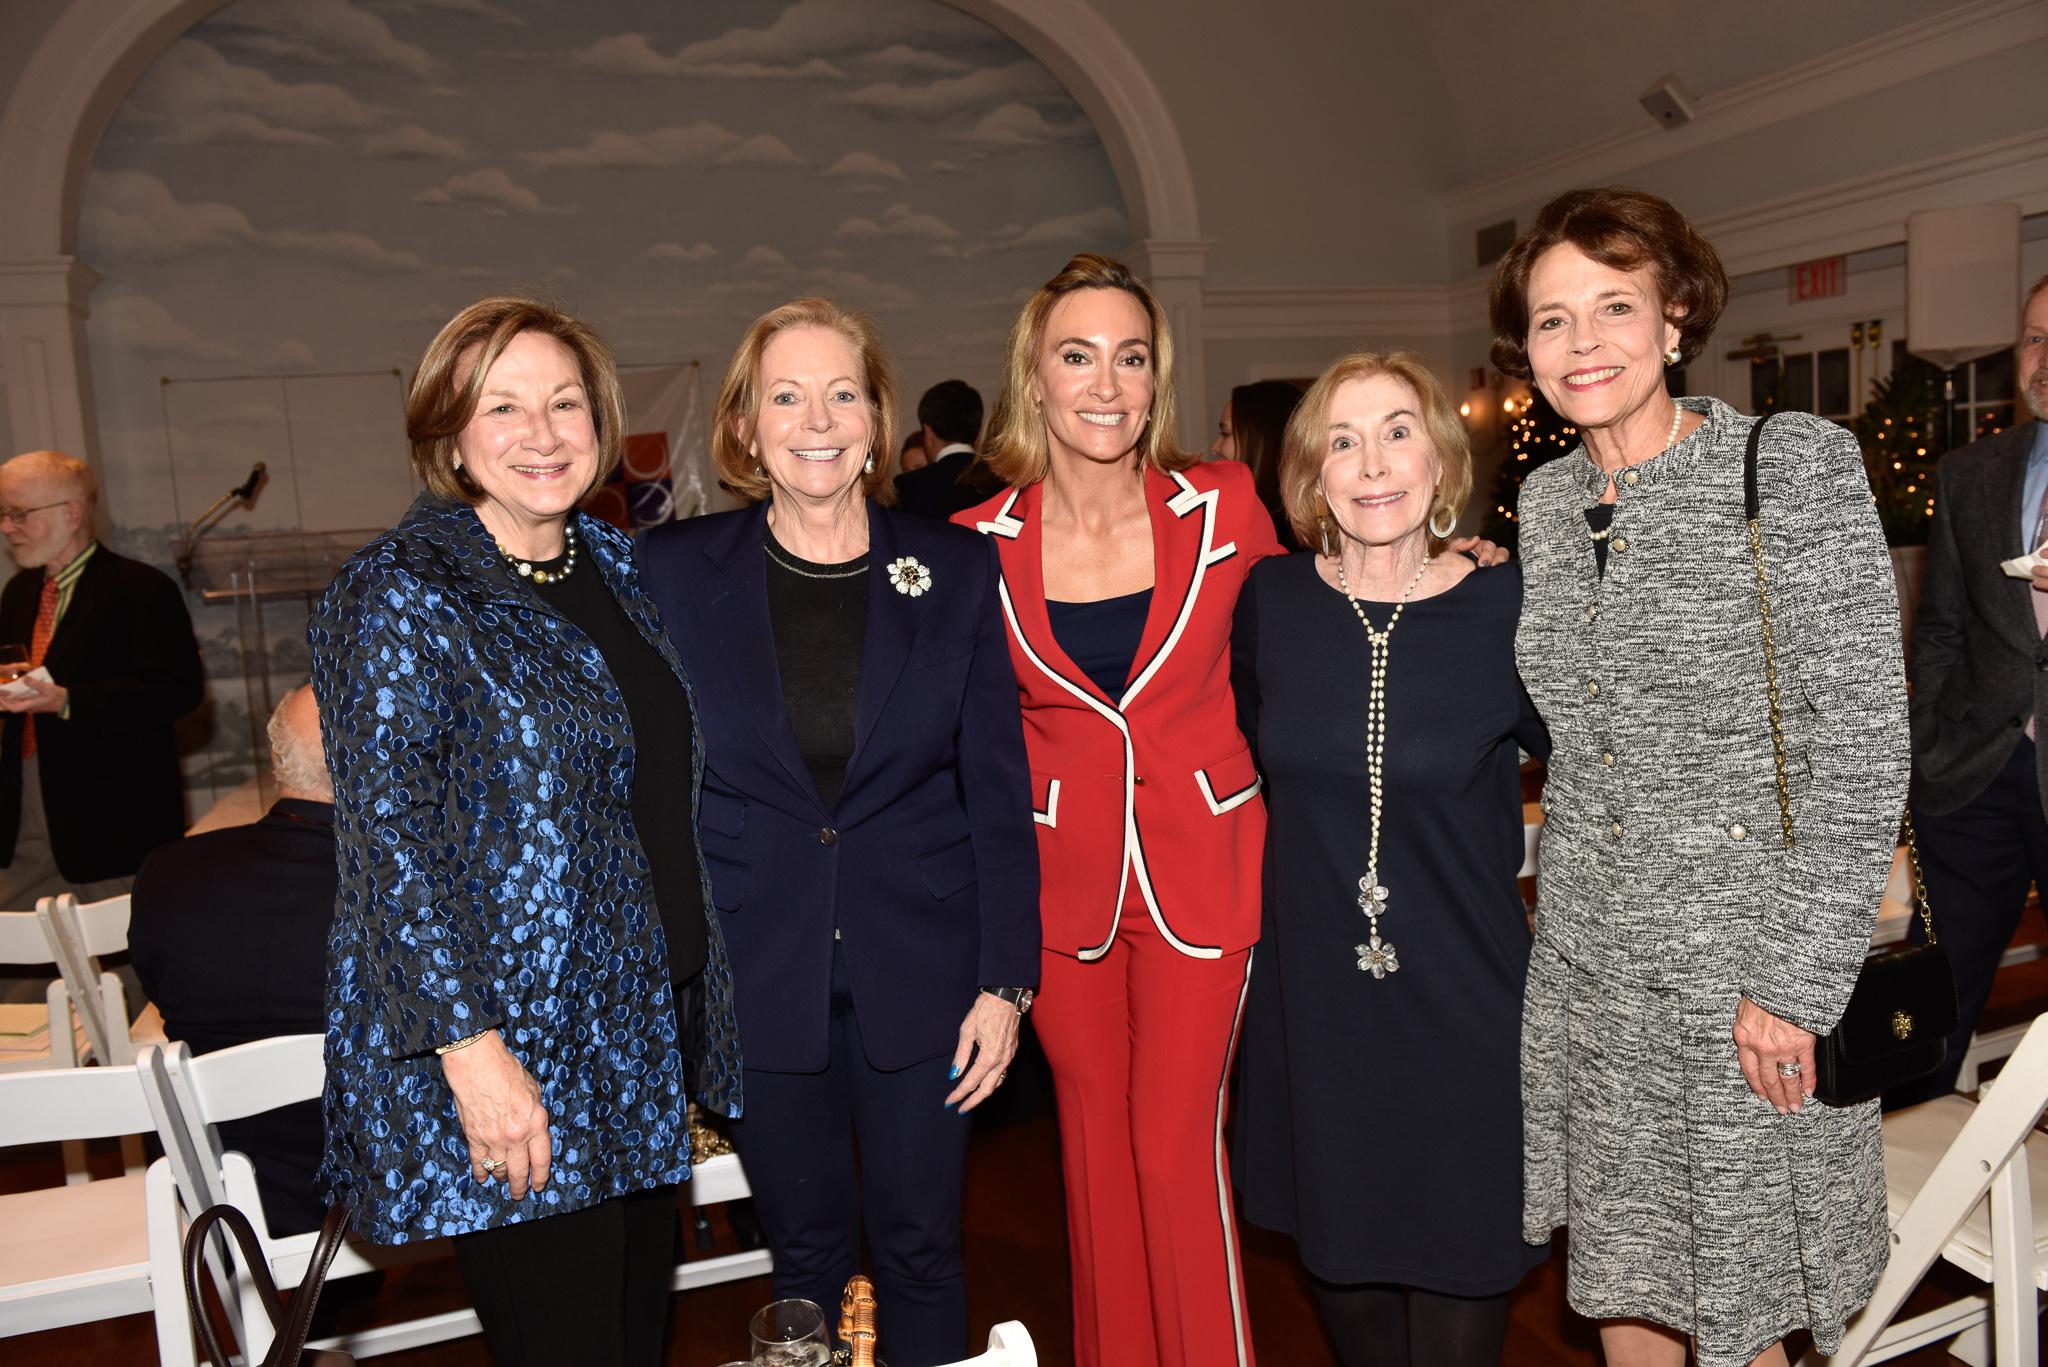 Susan Mahoney, Patricia Chadwick, Kathy Georgas, Leah Rukeyser, Cricket Lockhart